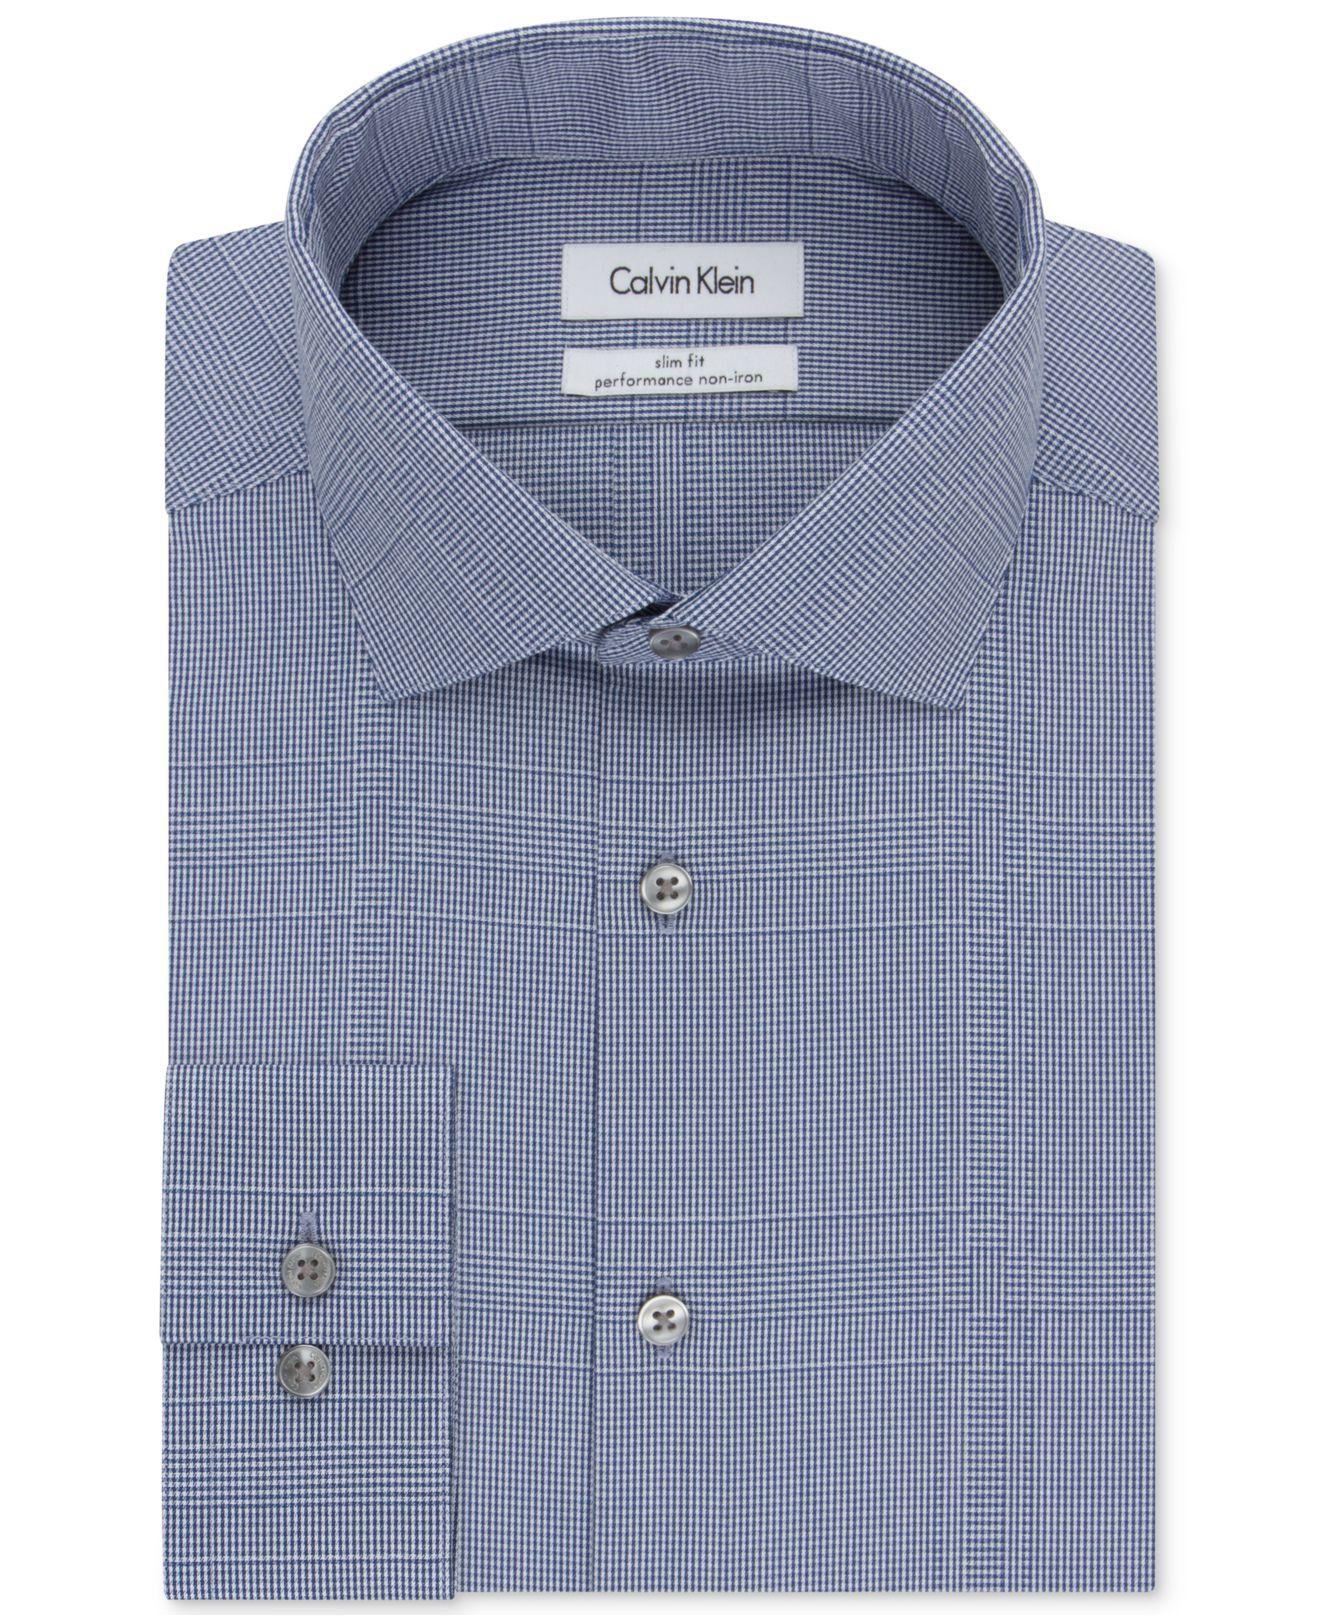 Calvin klein steel slim fit non iron performance english for No iron slim fit dress shirts